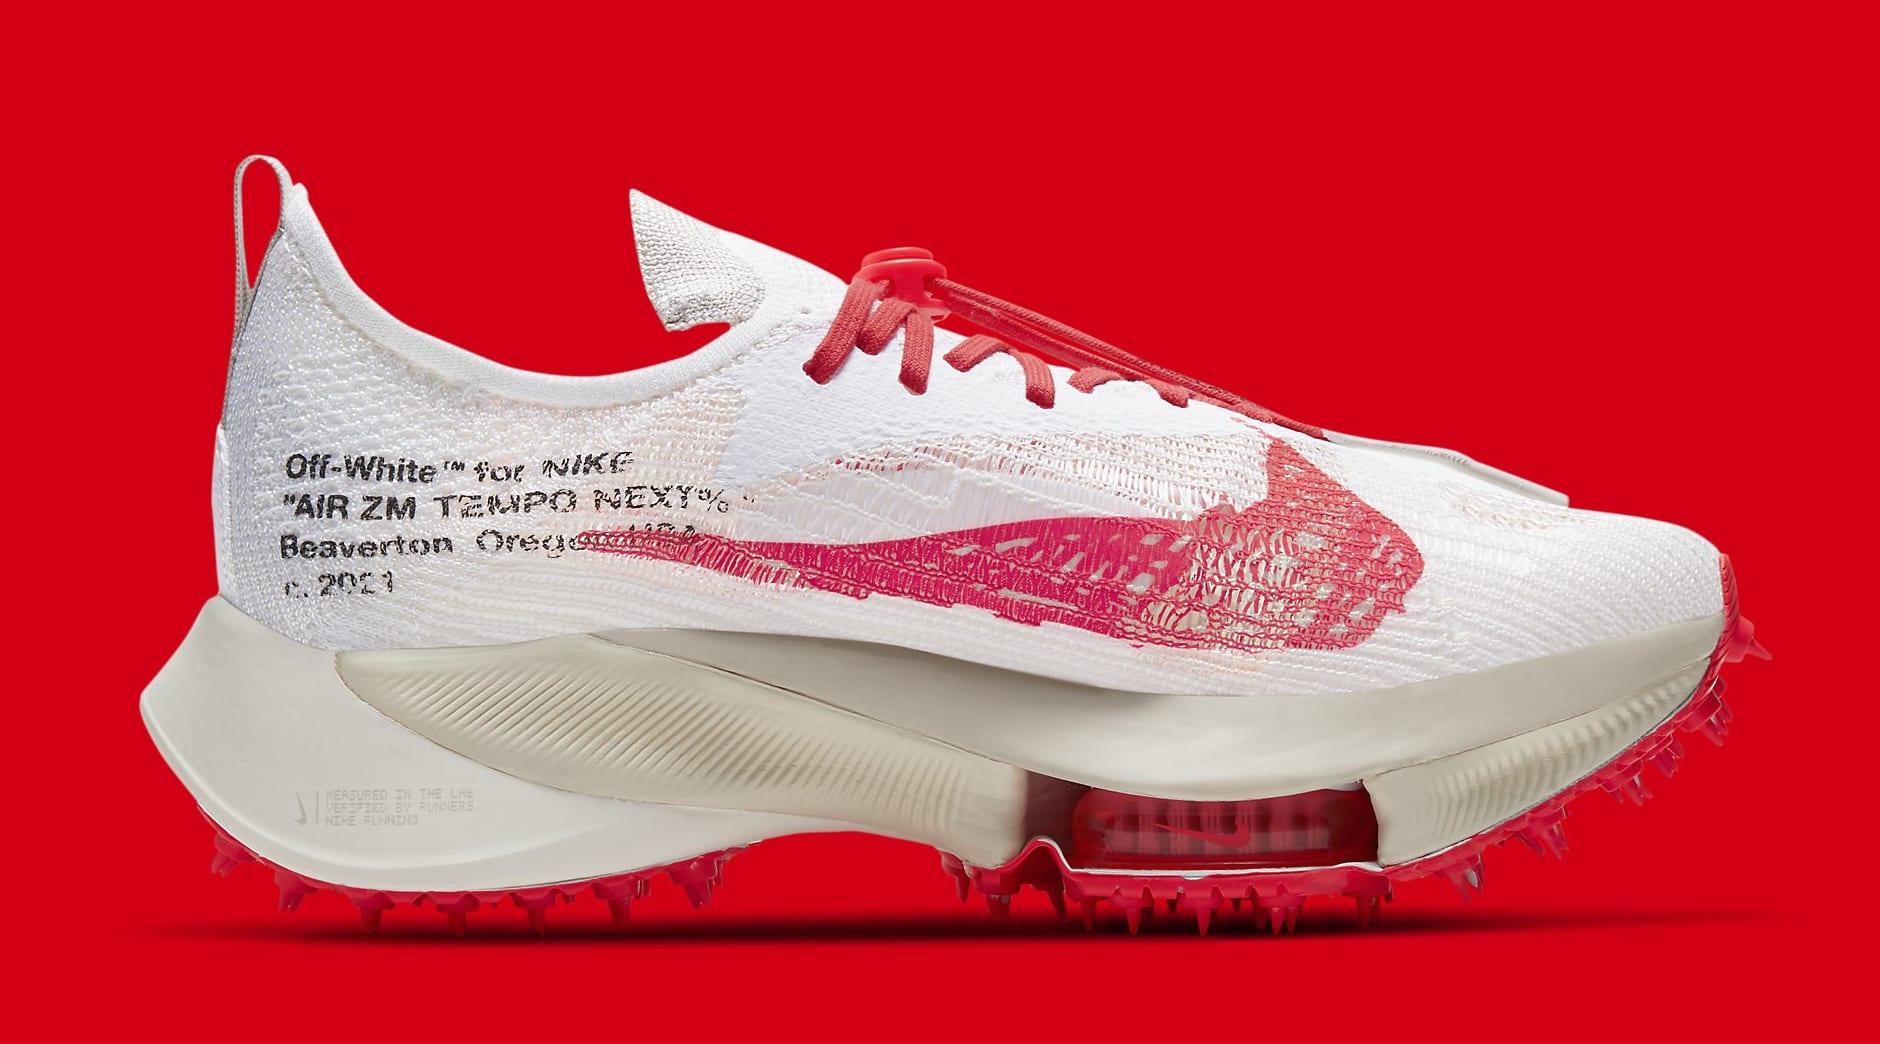 Off-White x Nike Air Zoom Tempo Next% CV0697-100 Medial